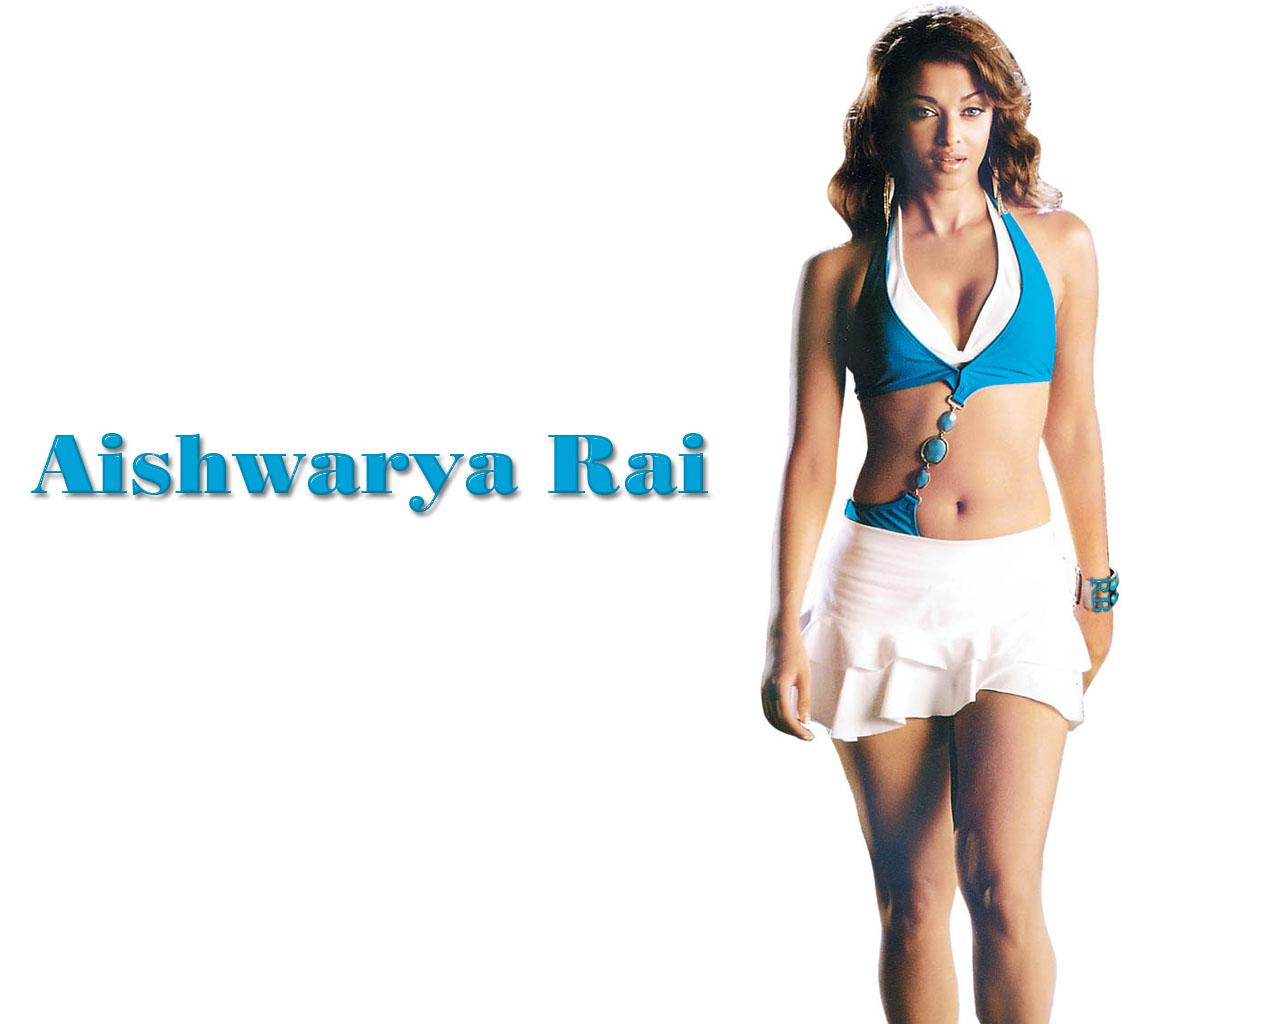 Aishwarya rai bikini video